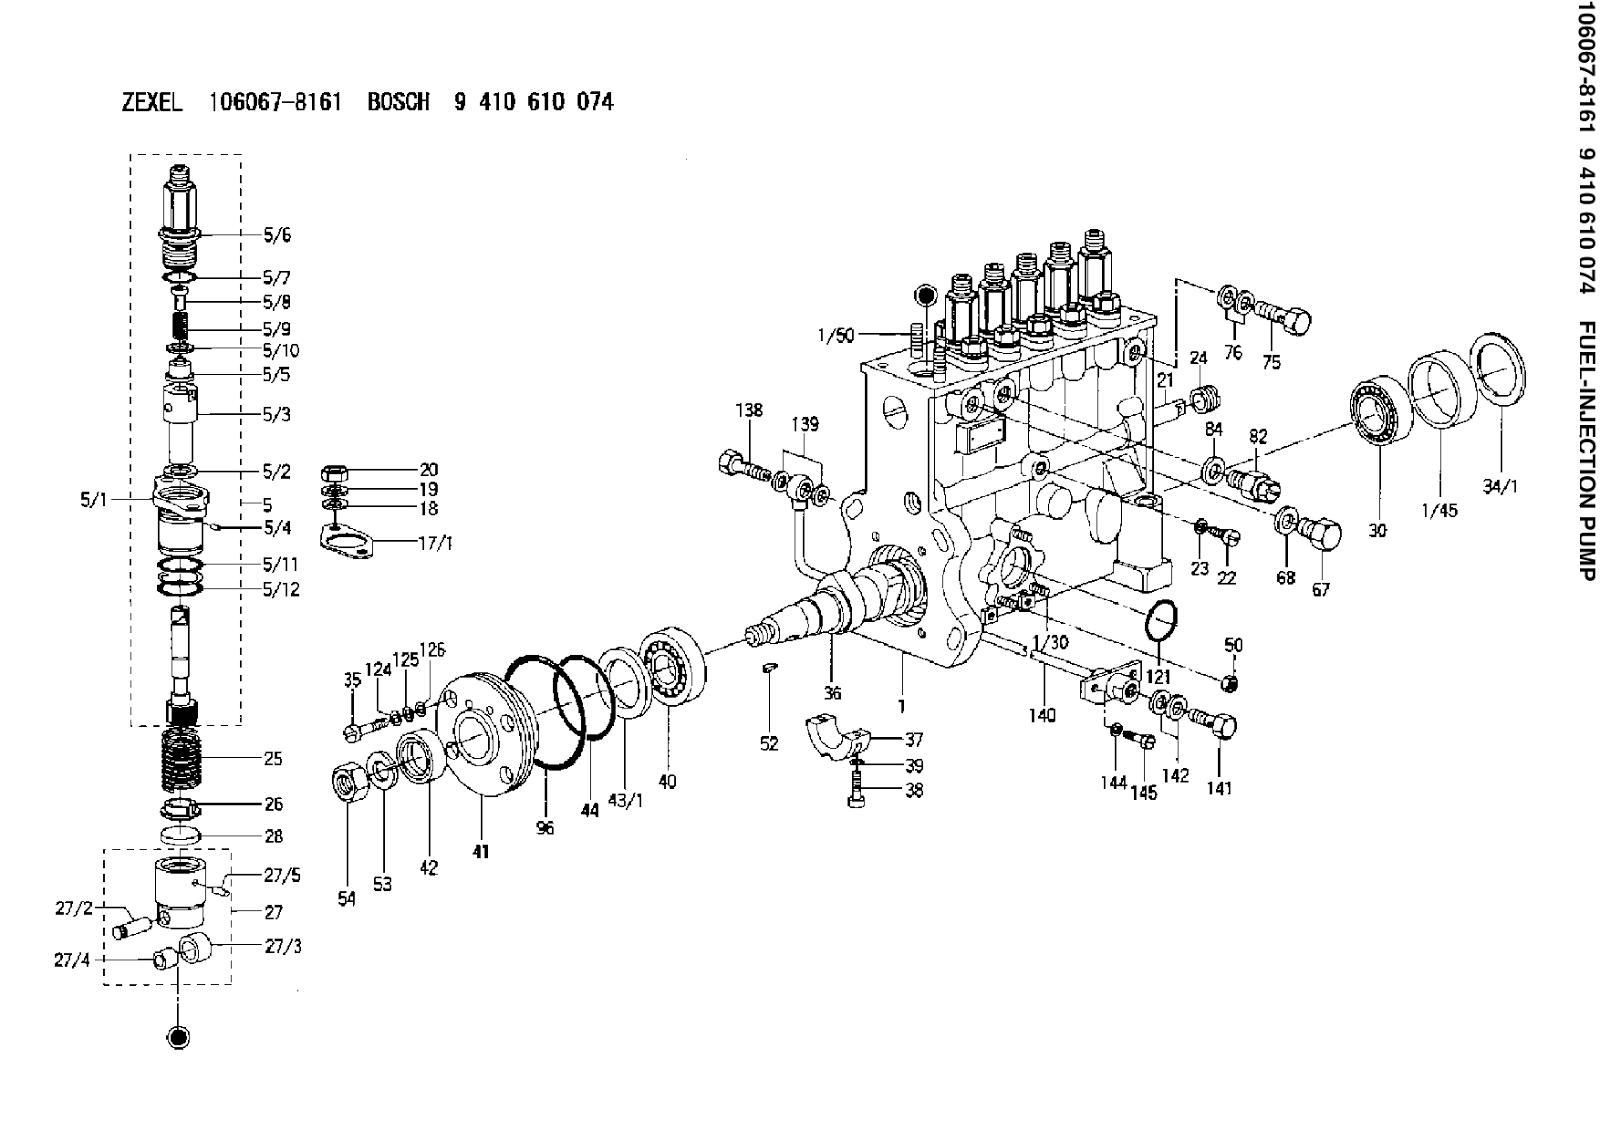 hight resolution of 9410610074 106067 8161 injection pump zexel bosch